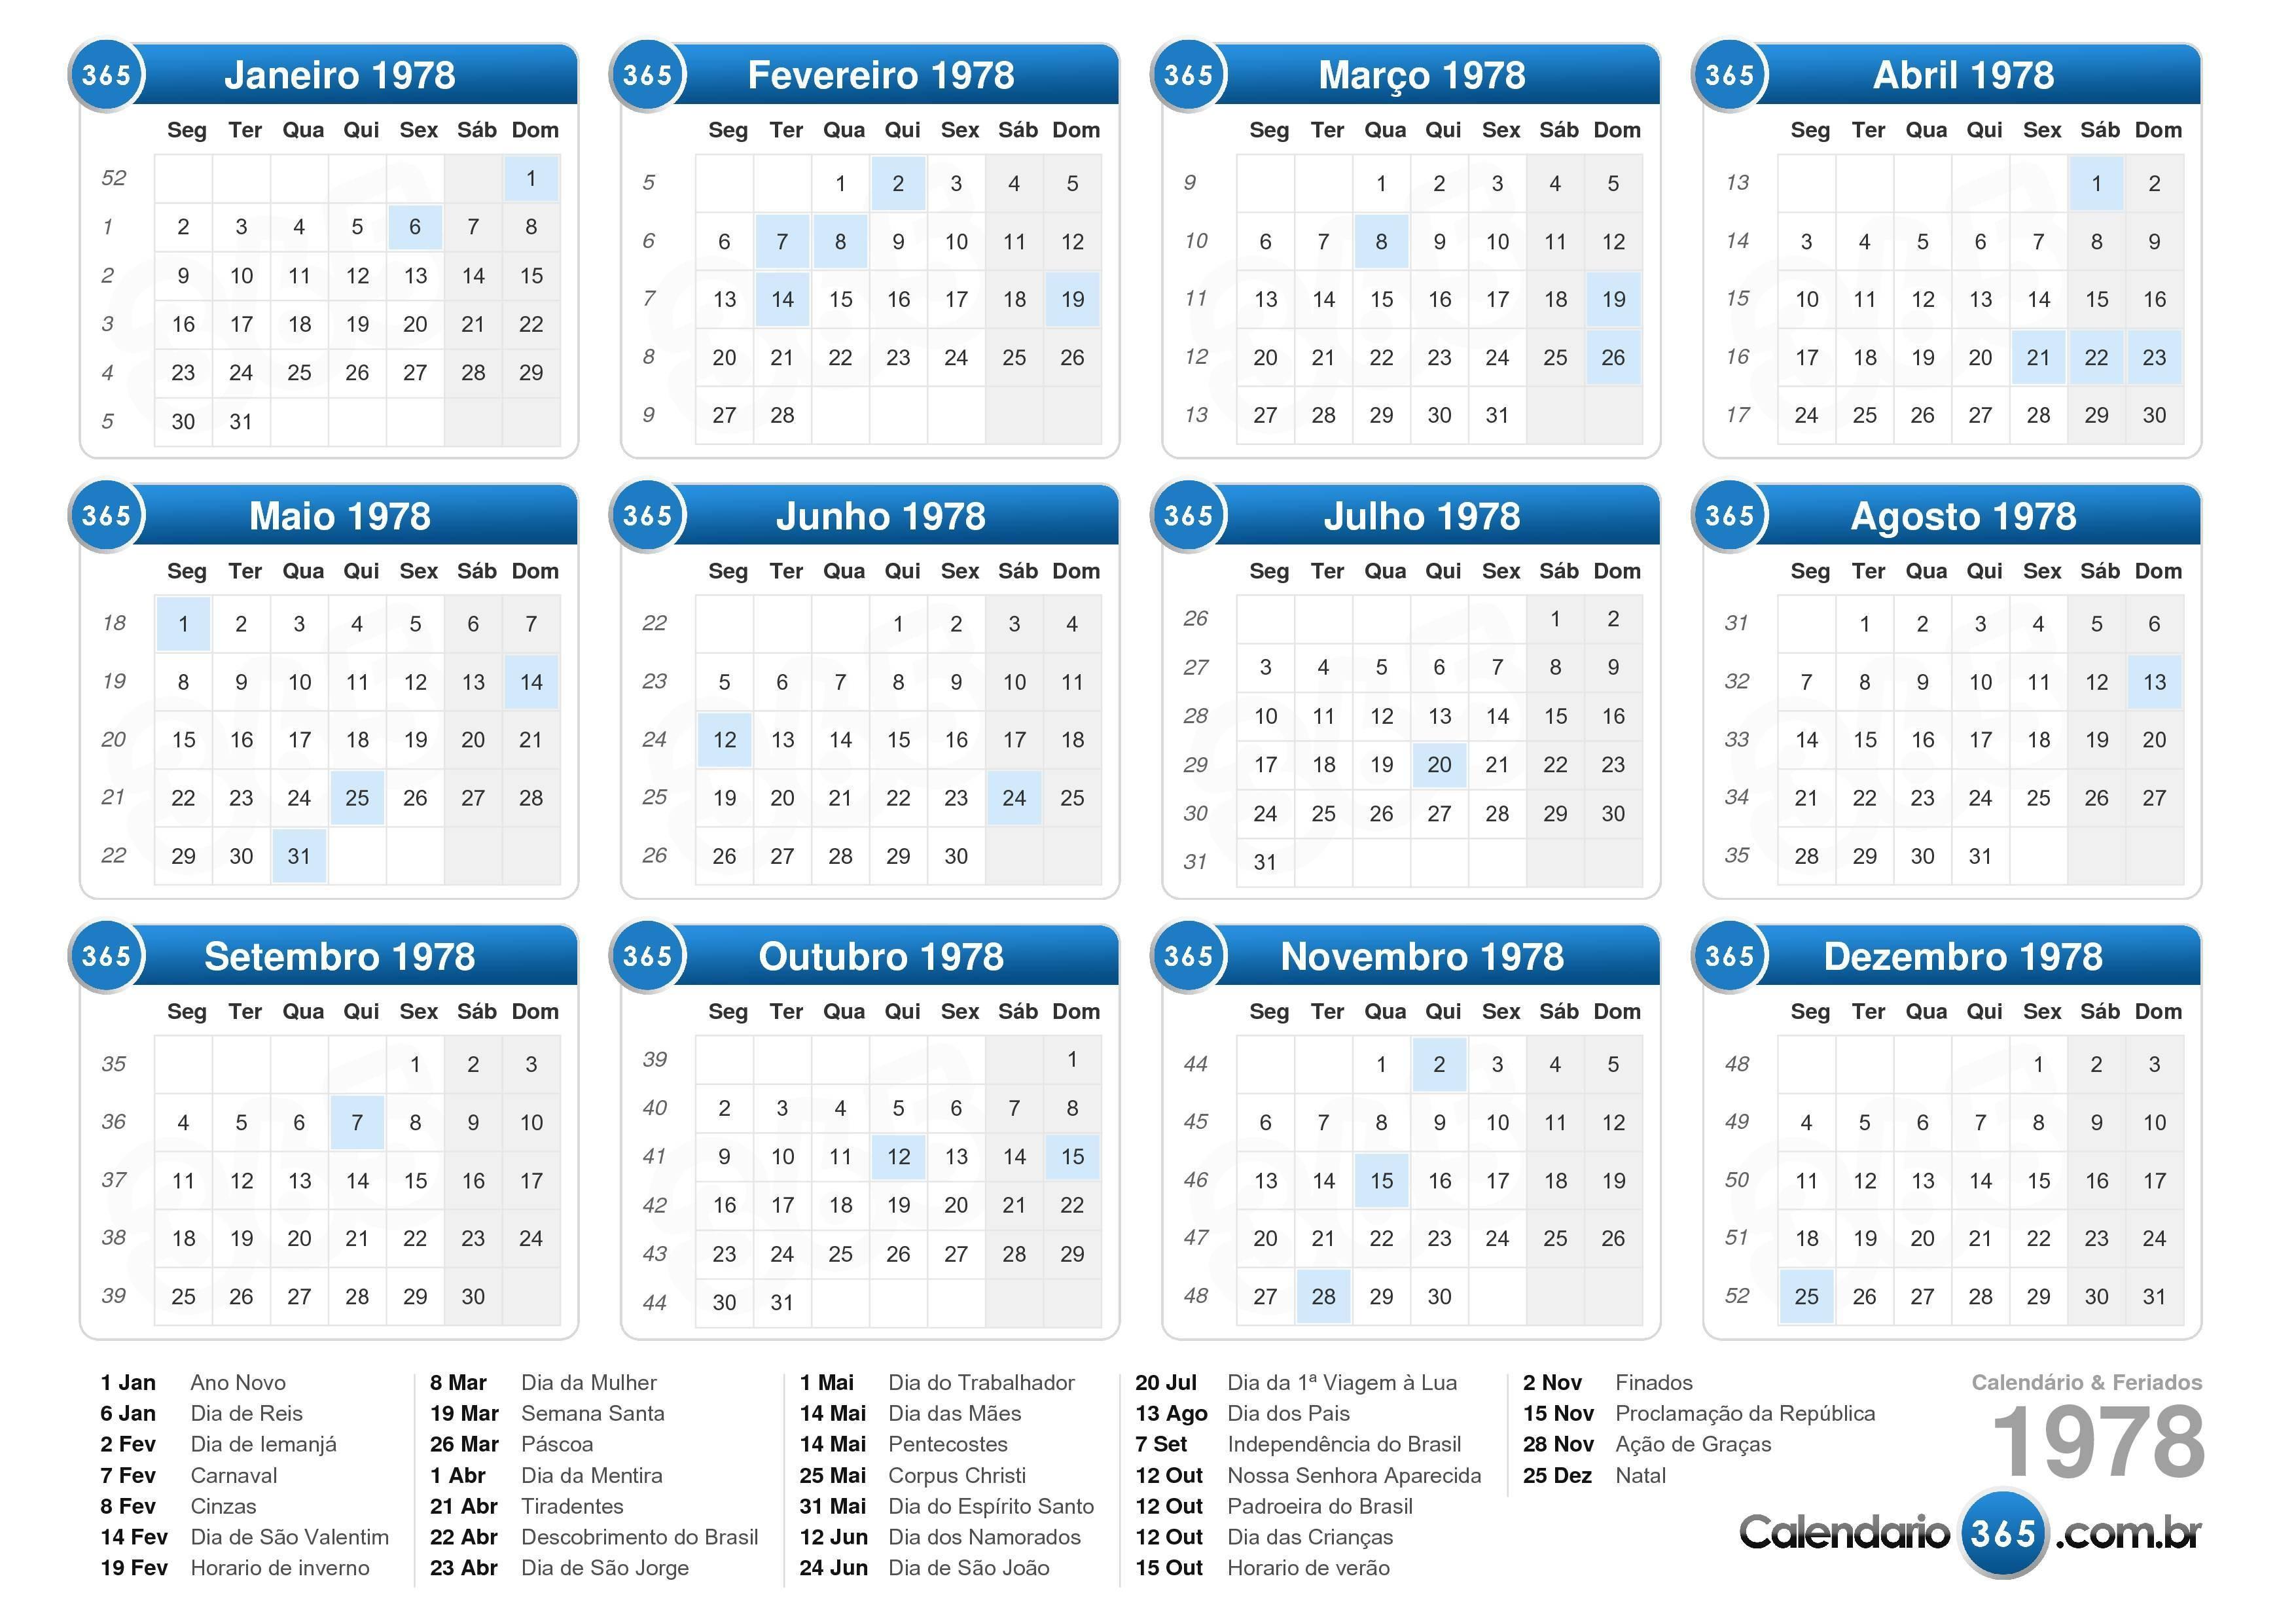 Calendário 2019 Feriados Portugal Excel Más Caliente Calendario Novembro 2018 Imprimir T